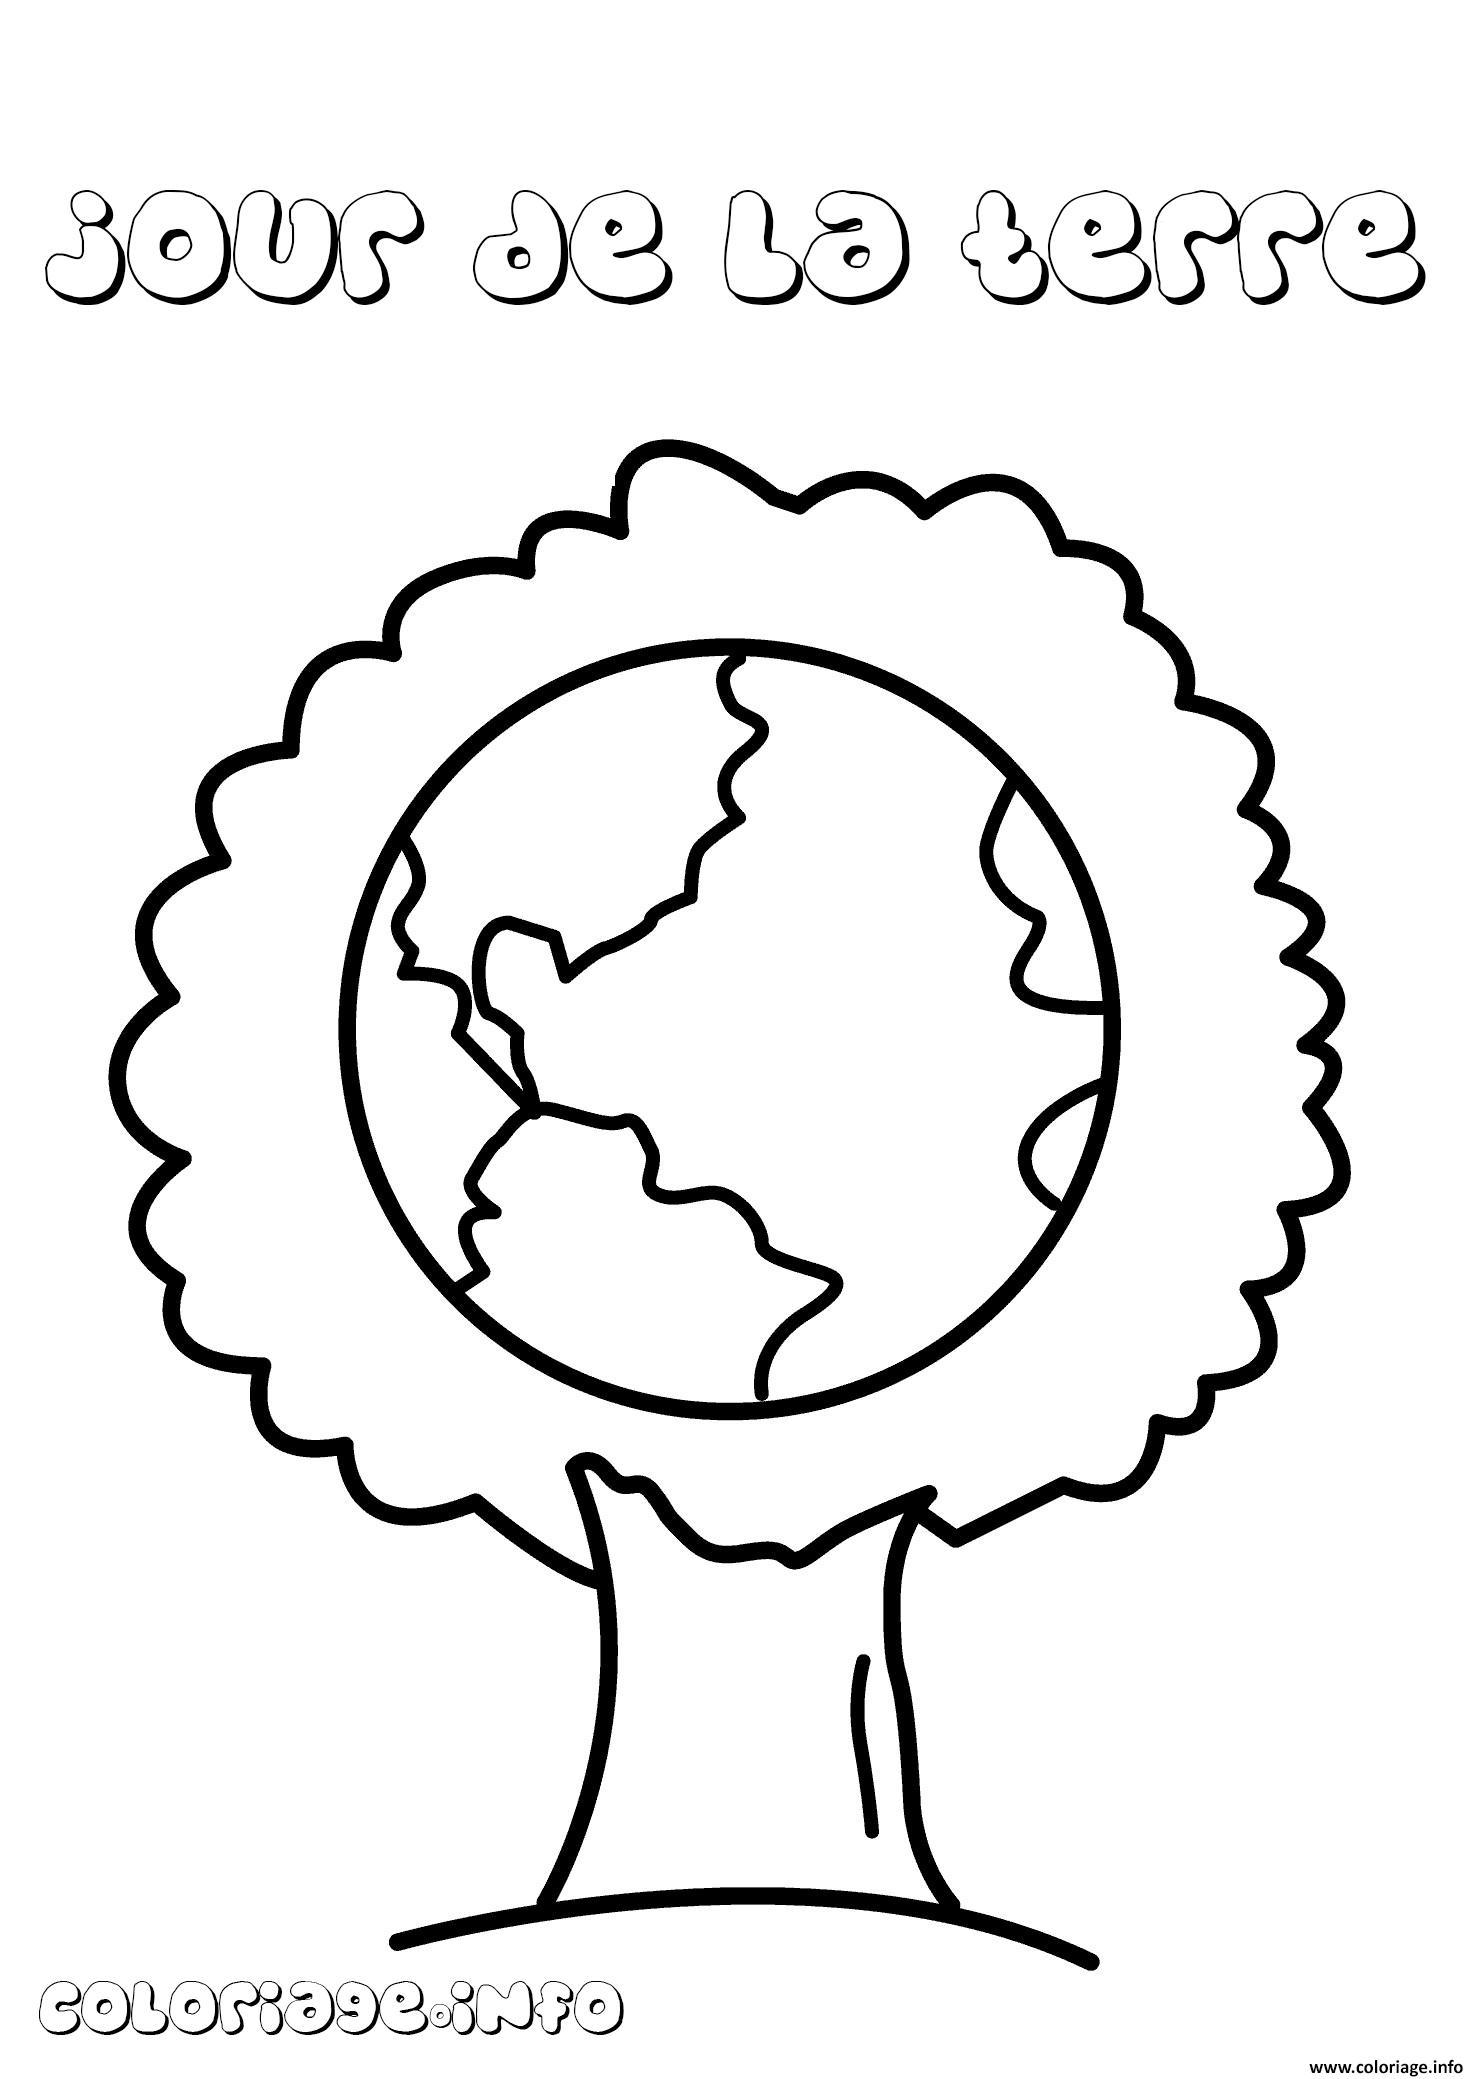 Coloriage Arbre Jour De La Terre dessin